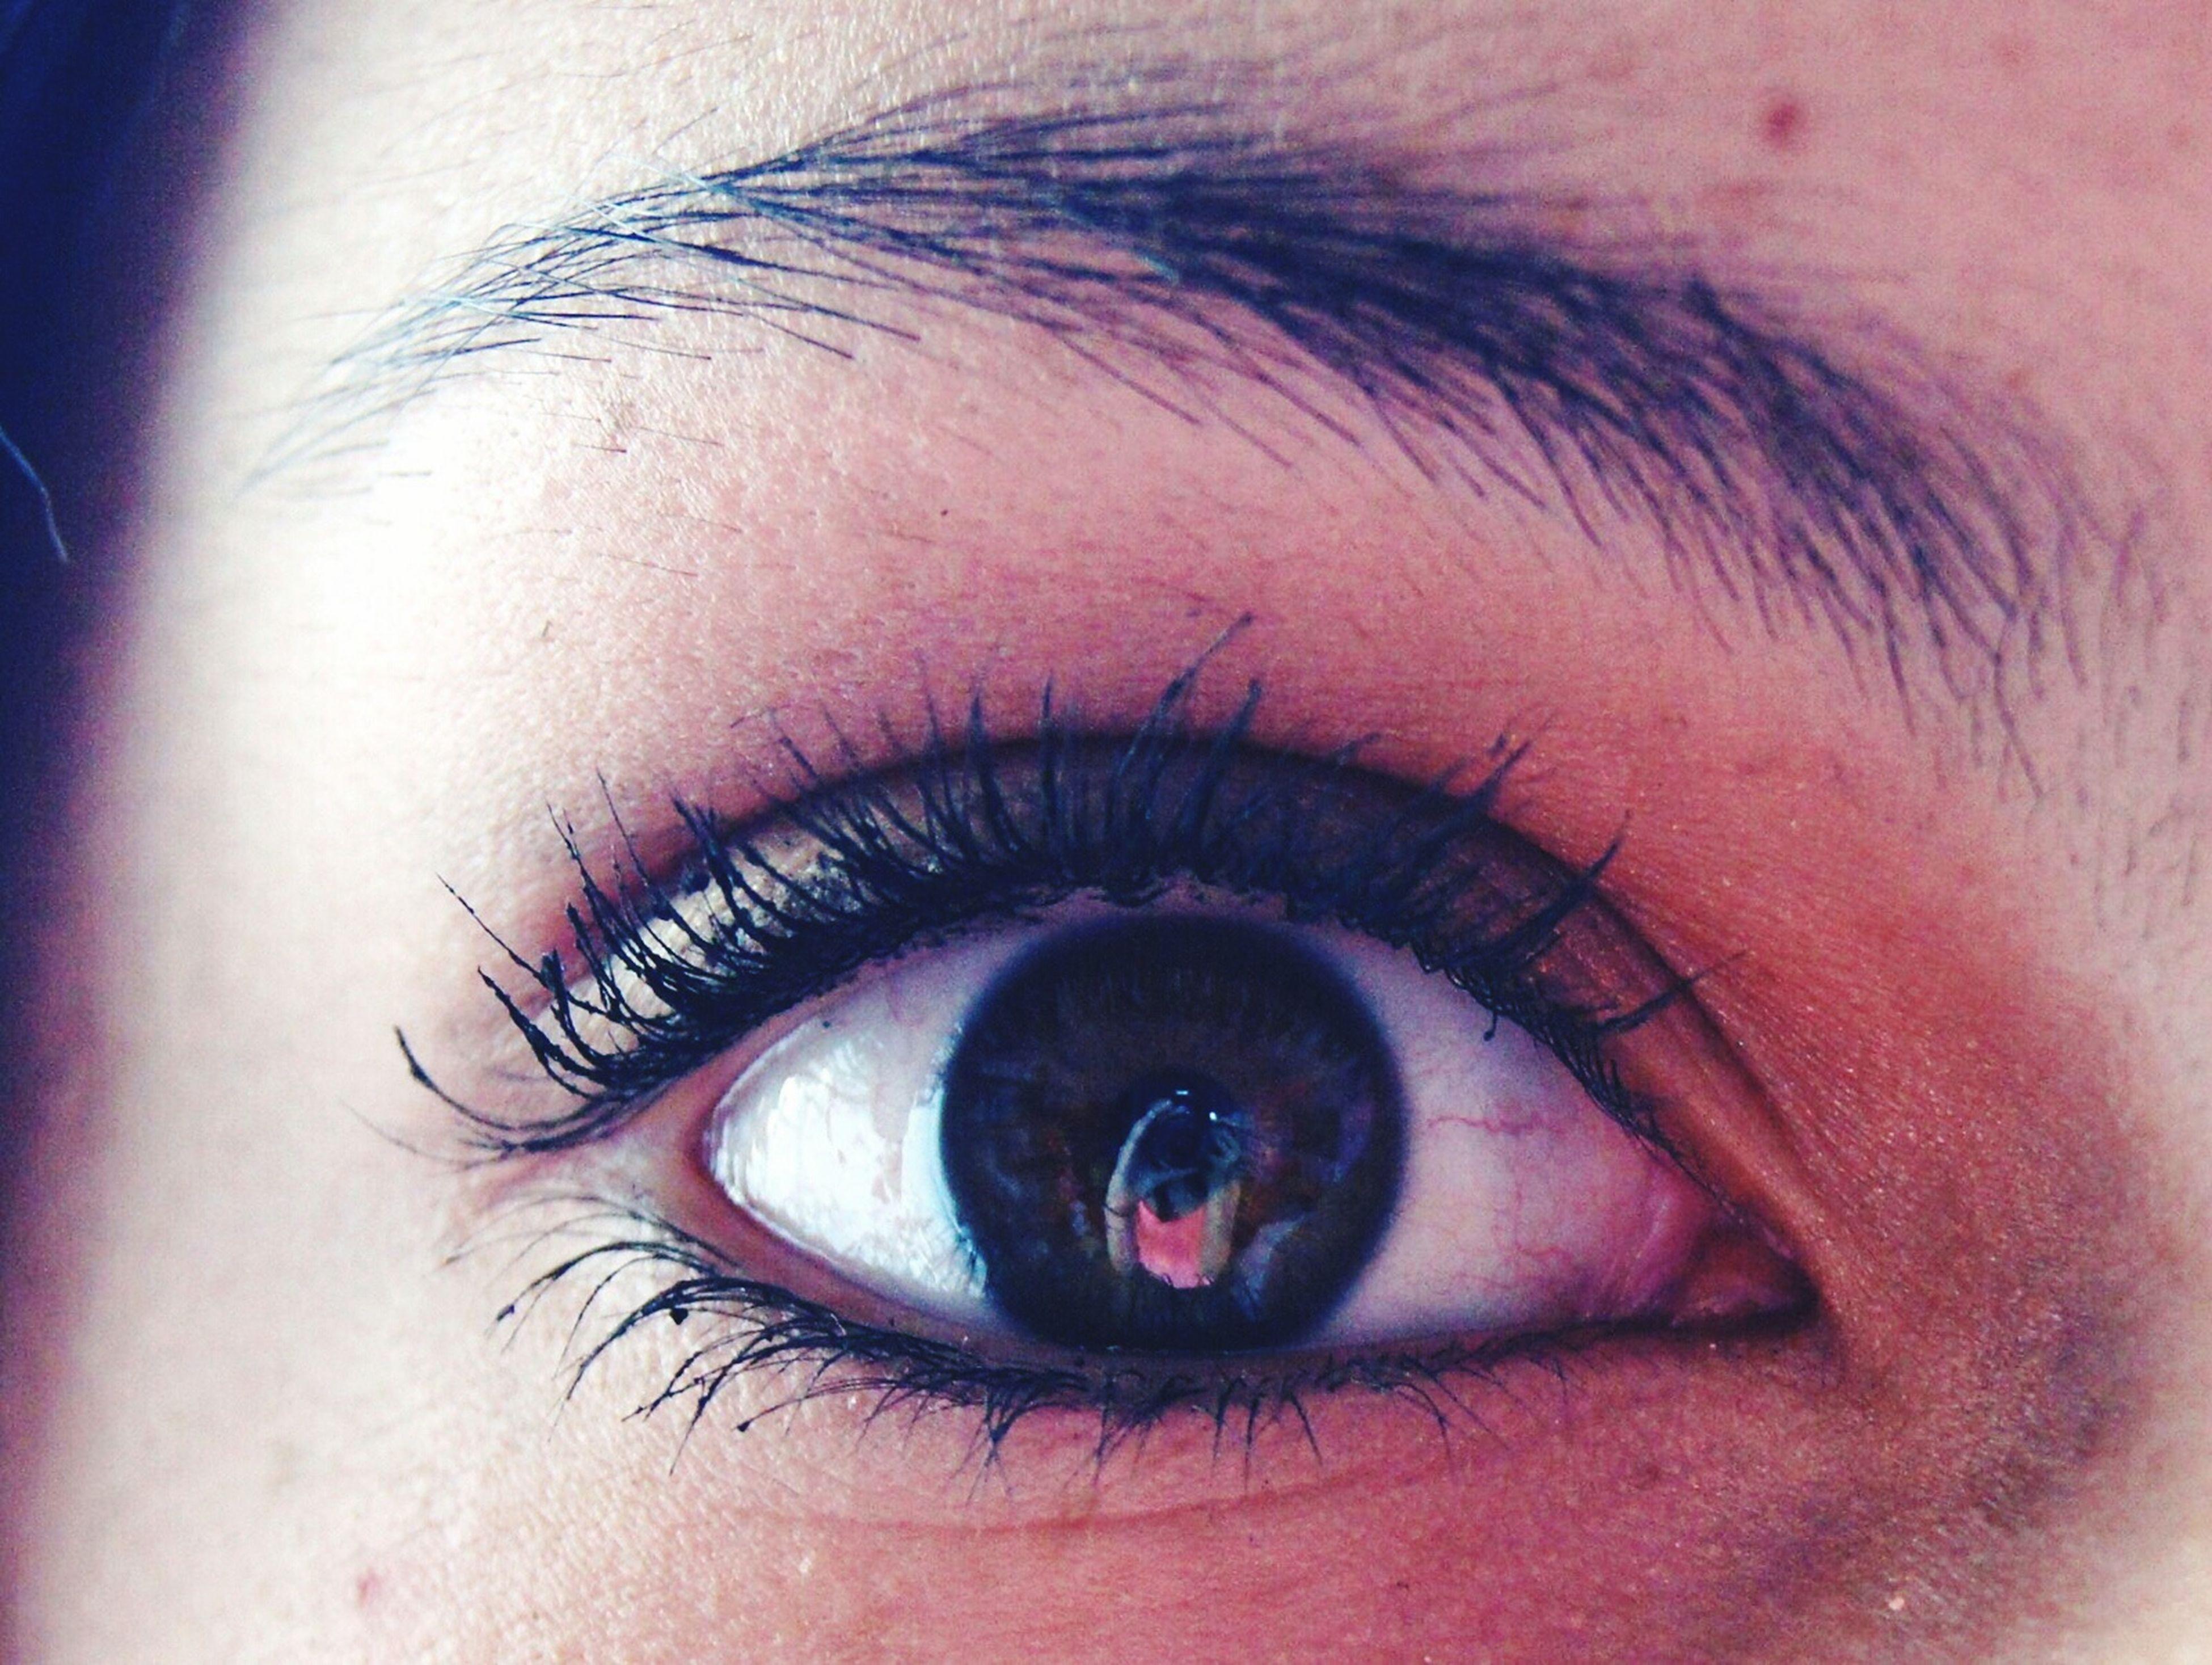 human eye, eyelash, close-up, eyesight, looking at camera, sensory perception, portrait, part of, eyeball, iris - eye, human skin, extreme close-up, human face, lifestyles, eyebrow, person, indoors